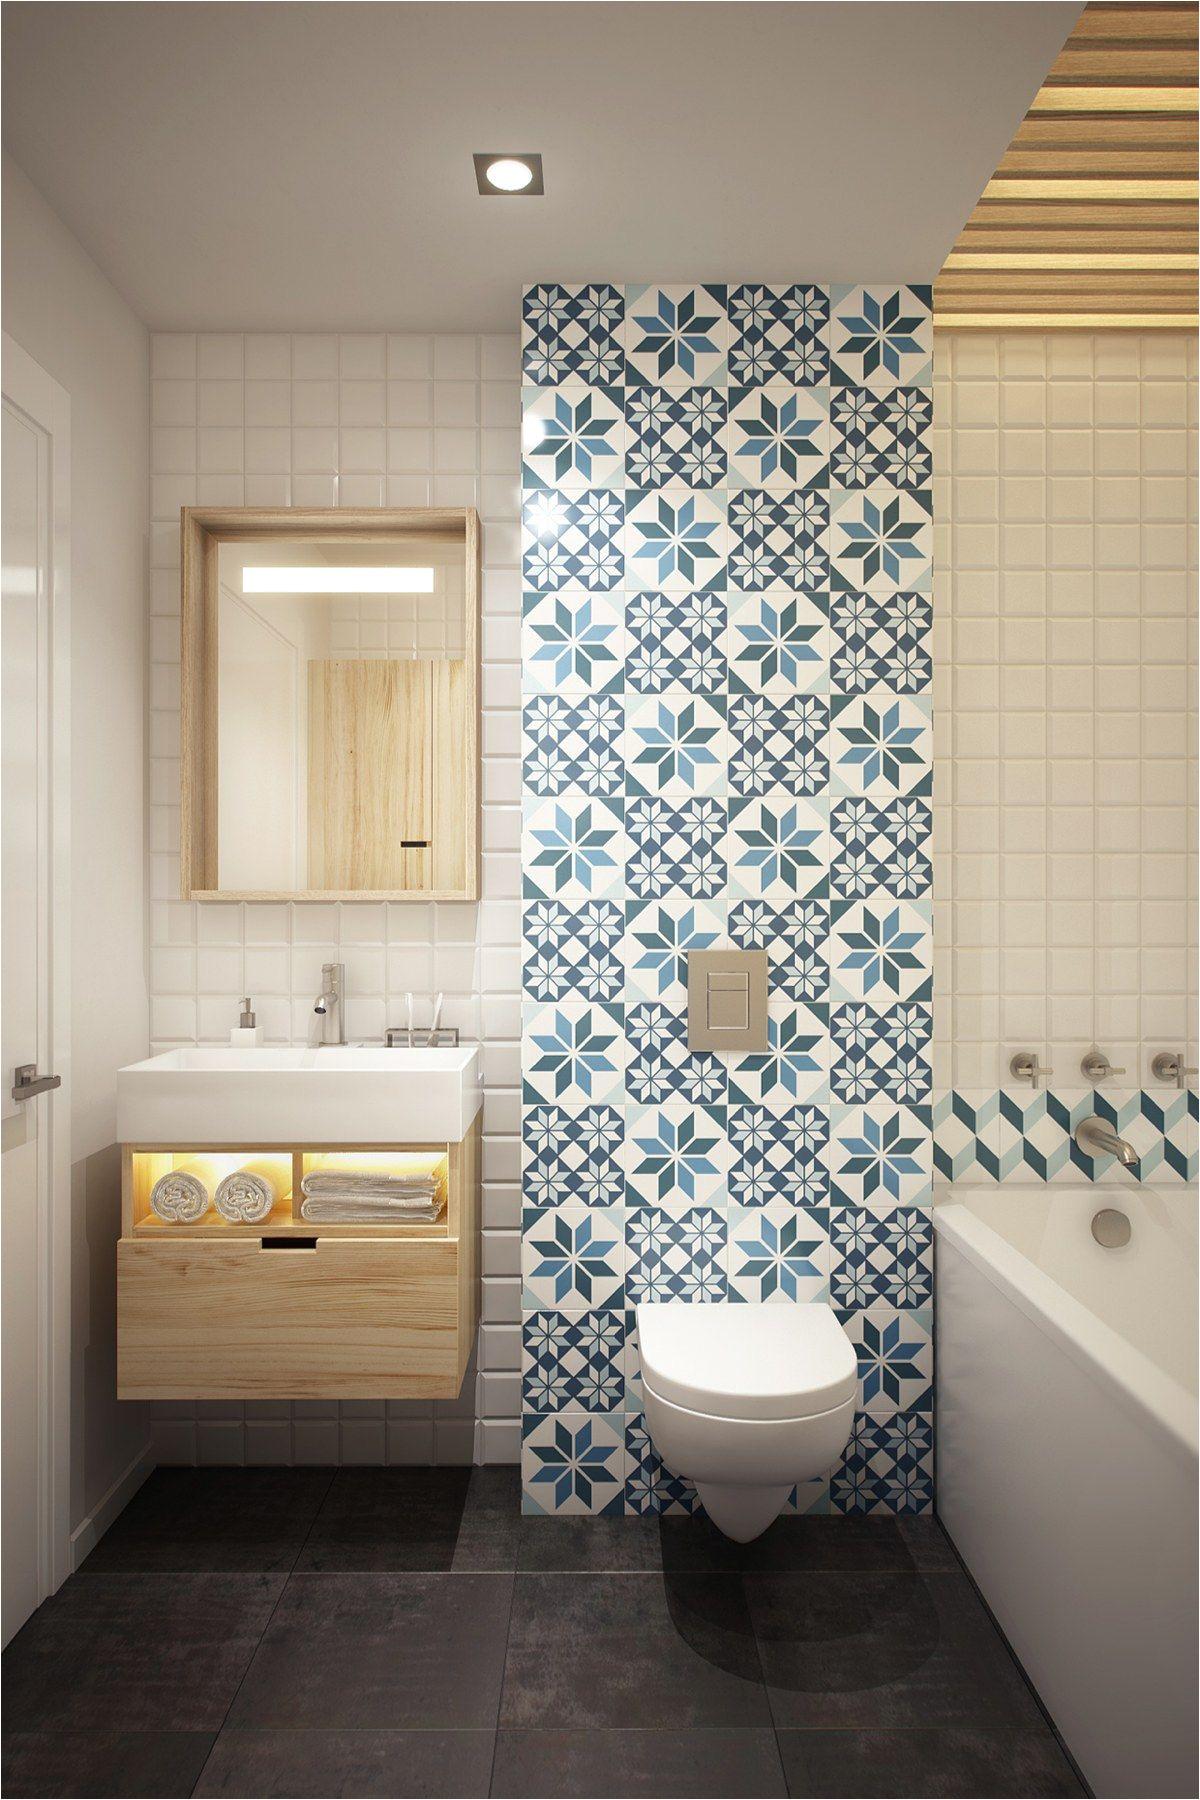 gorgeous bathroom tile design ideas for small bathrooms and tri prekrasna apartmana manjih od 50 kvadrata